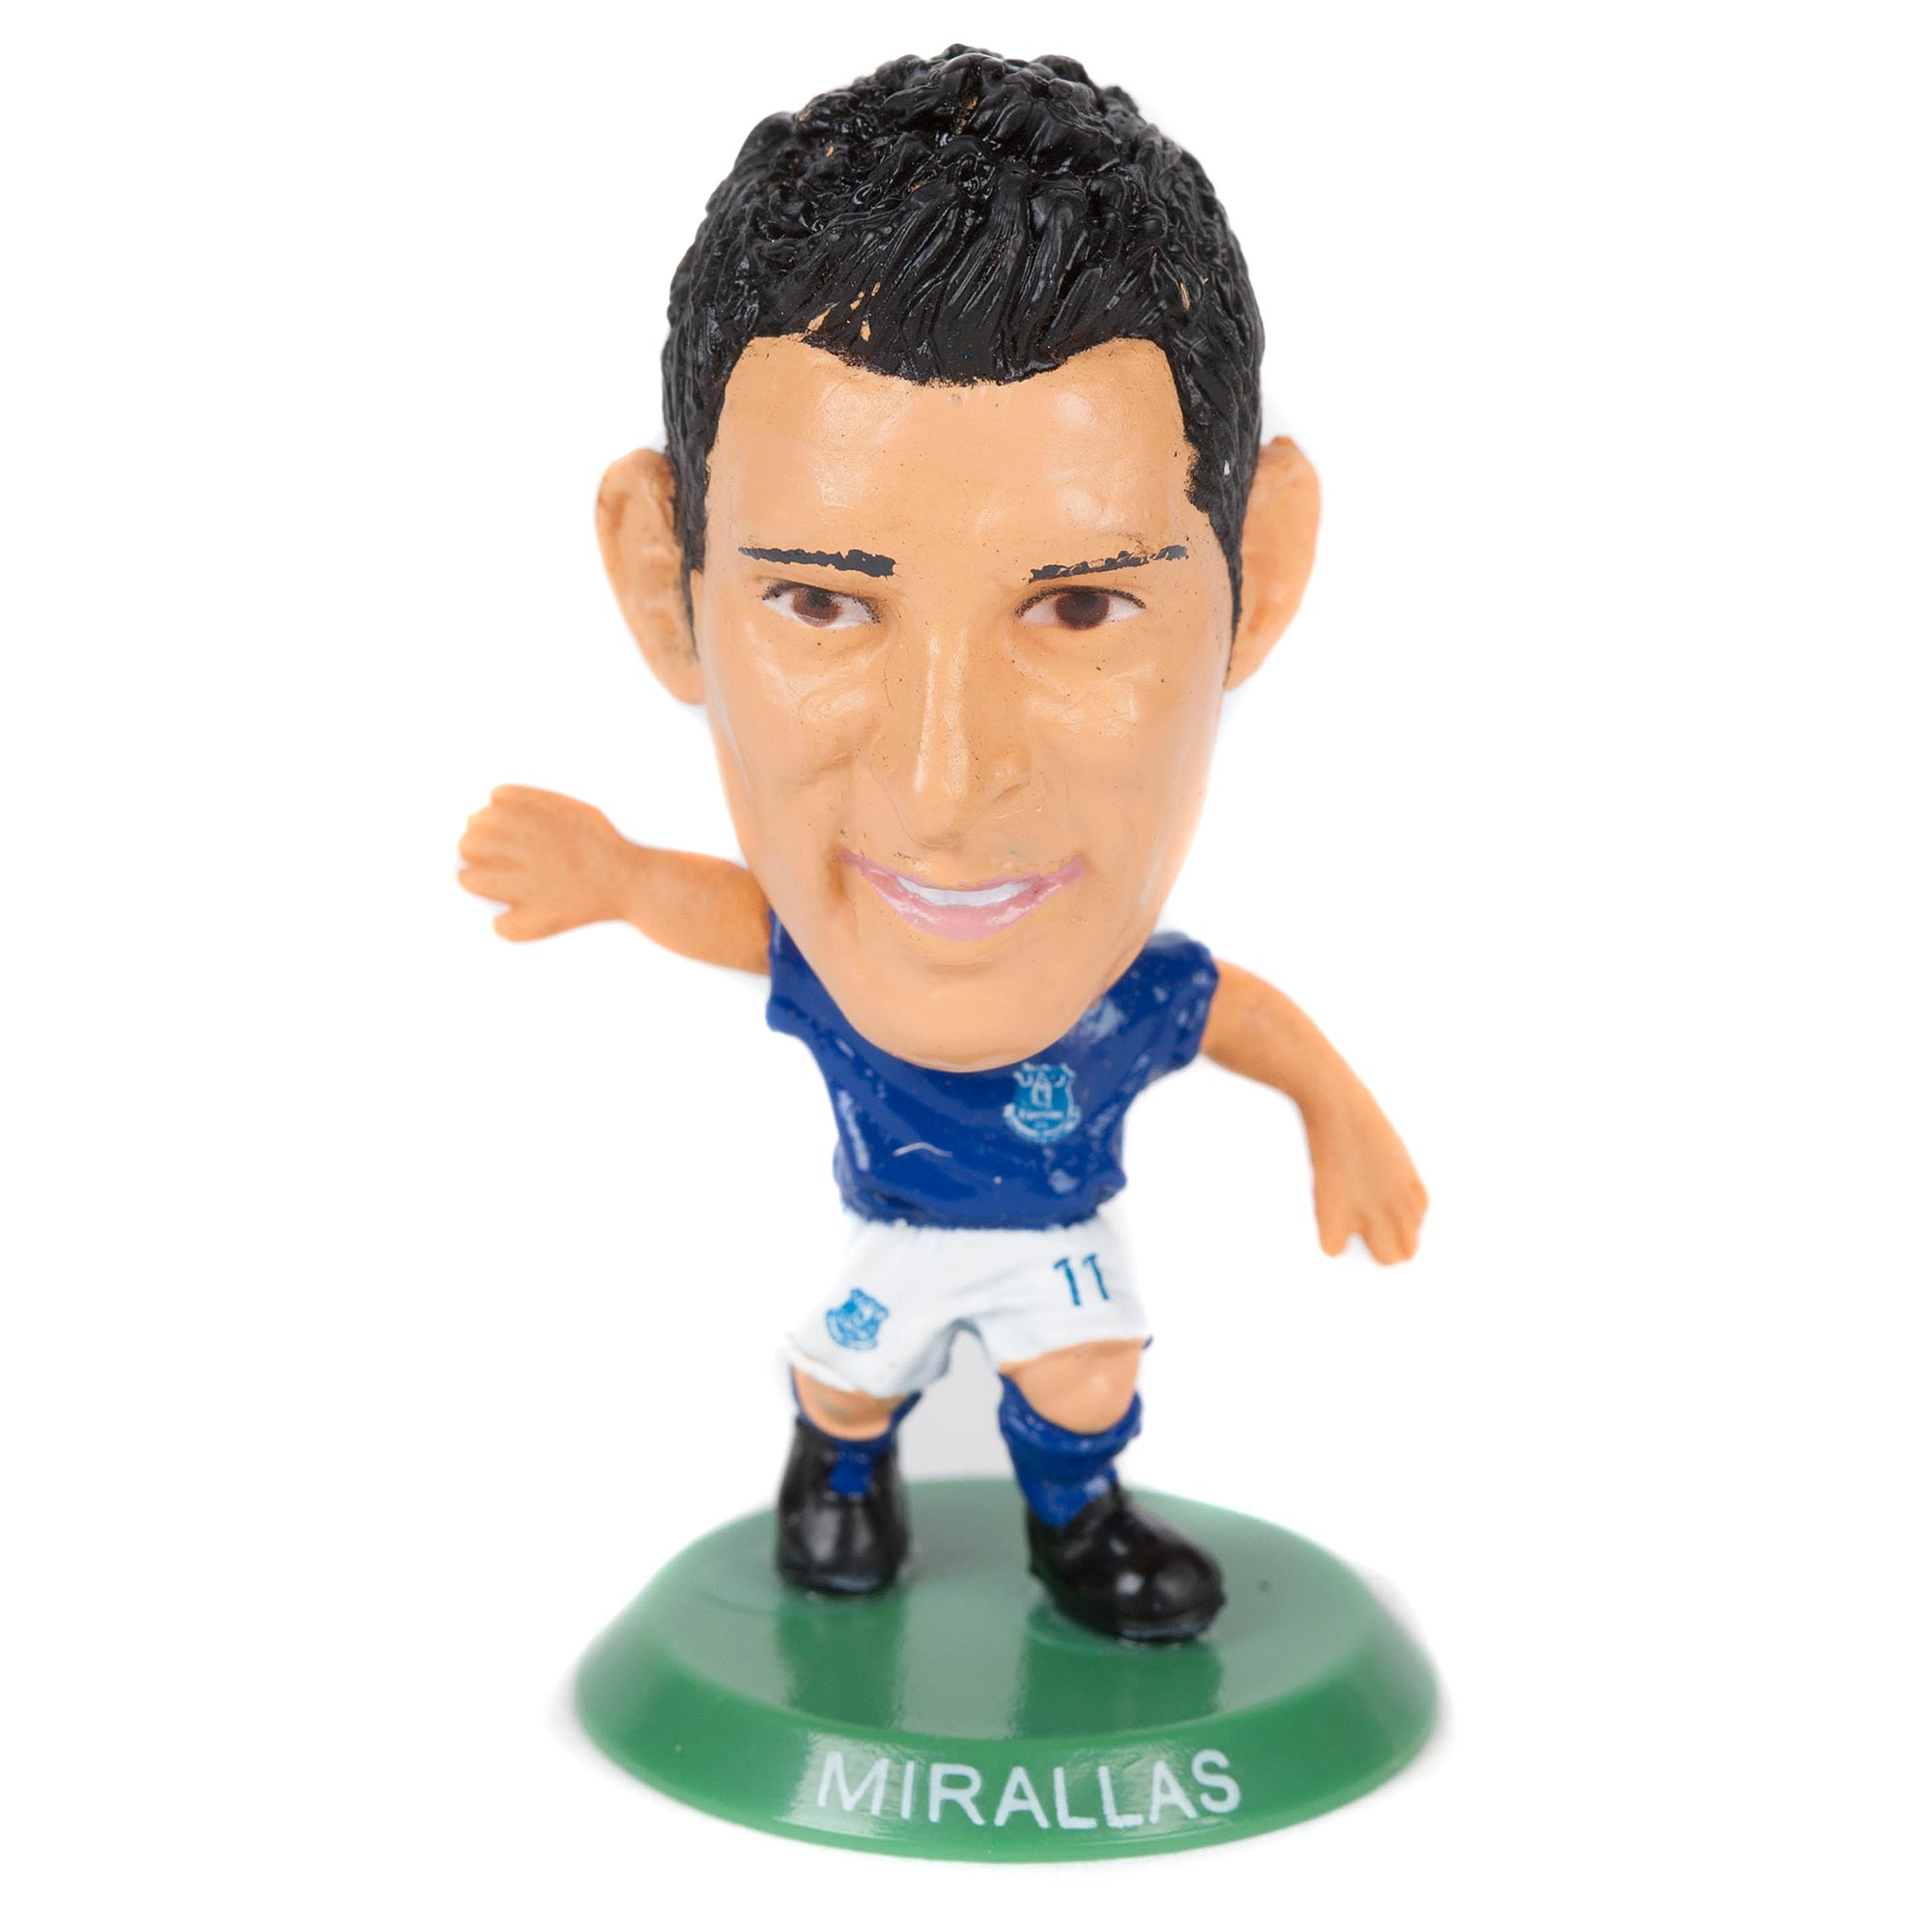 Everton Mirallas SoccerStarz